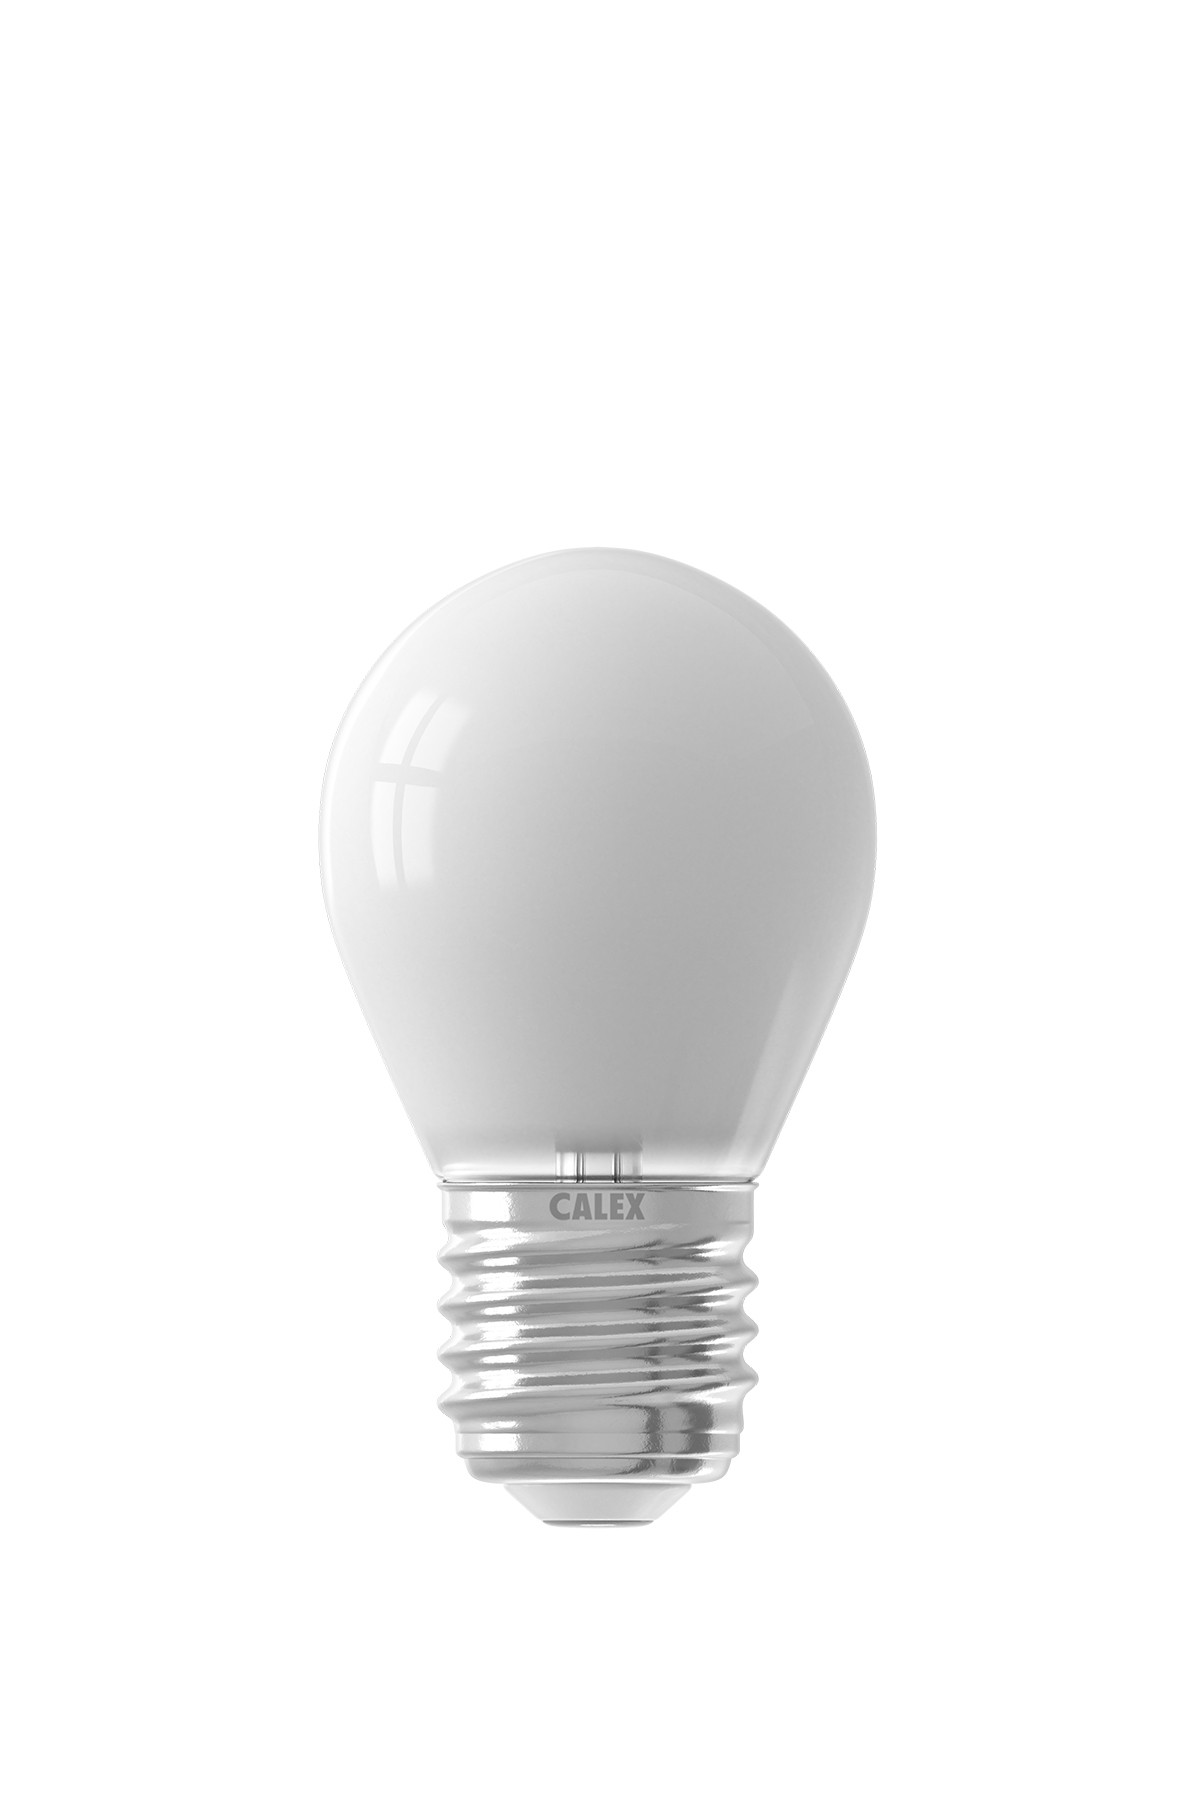 Calex Smart Spherical LED lamp 4,5W 400lm 2200-4000K